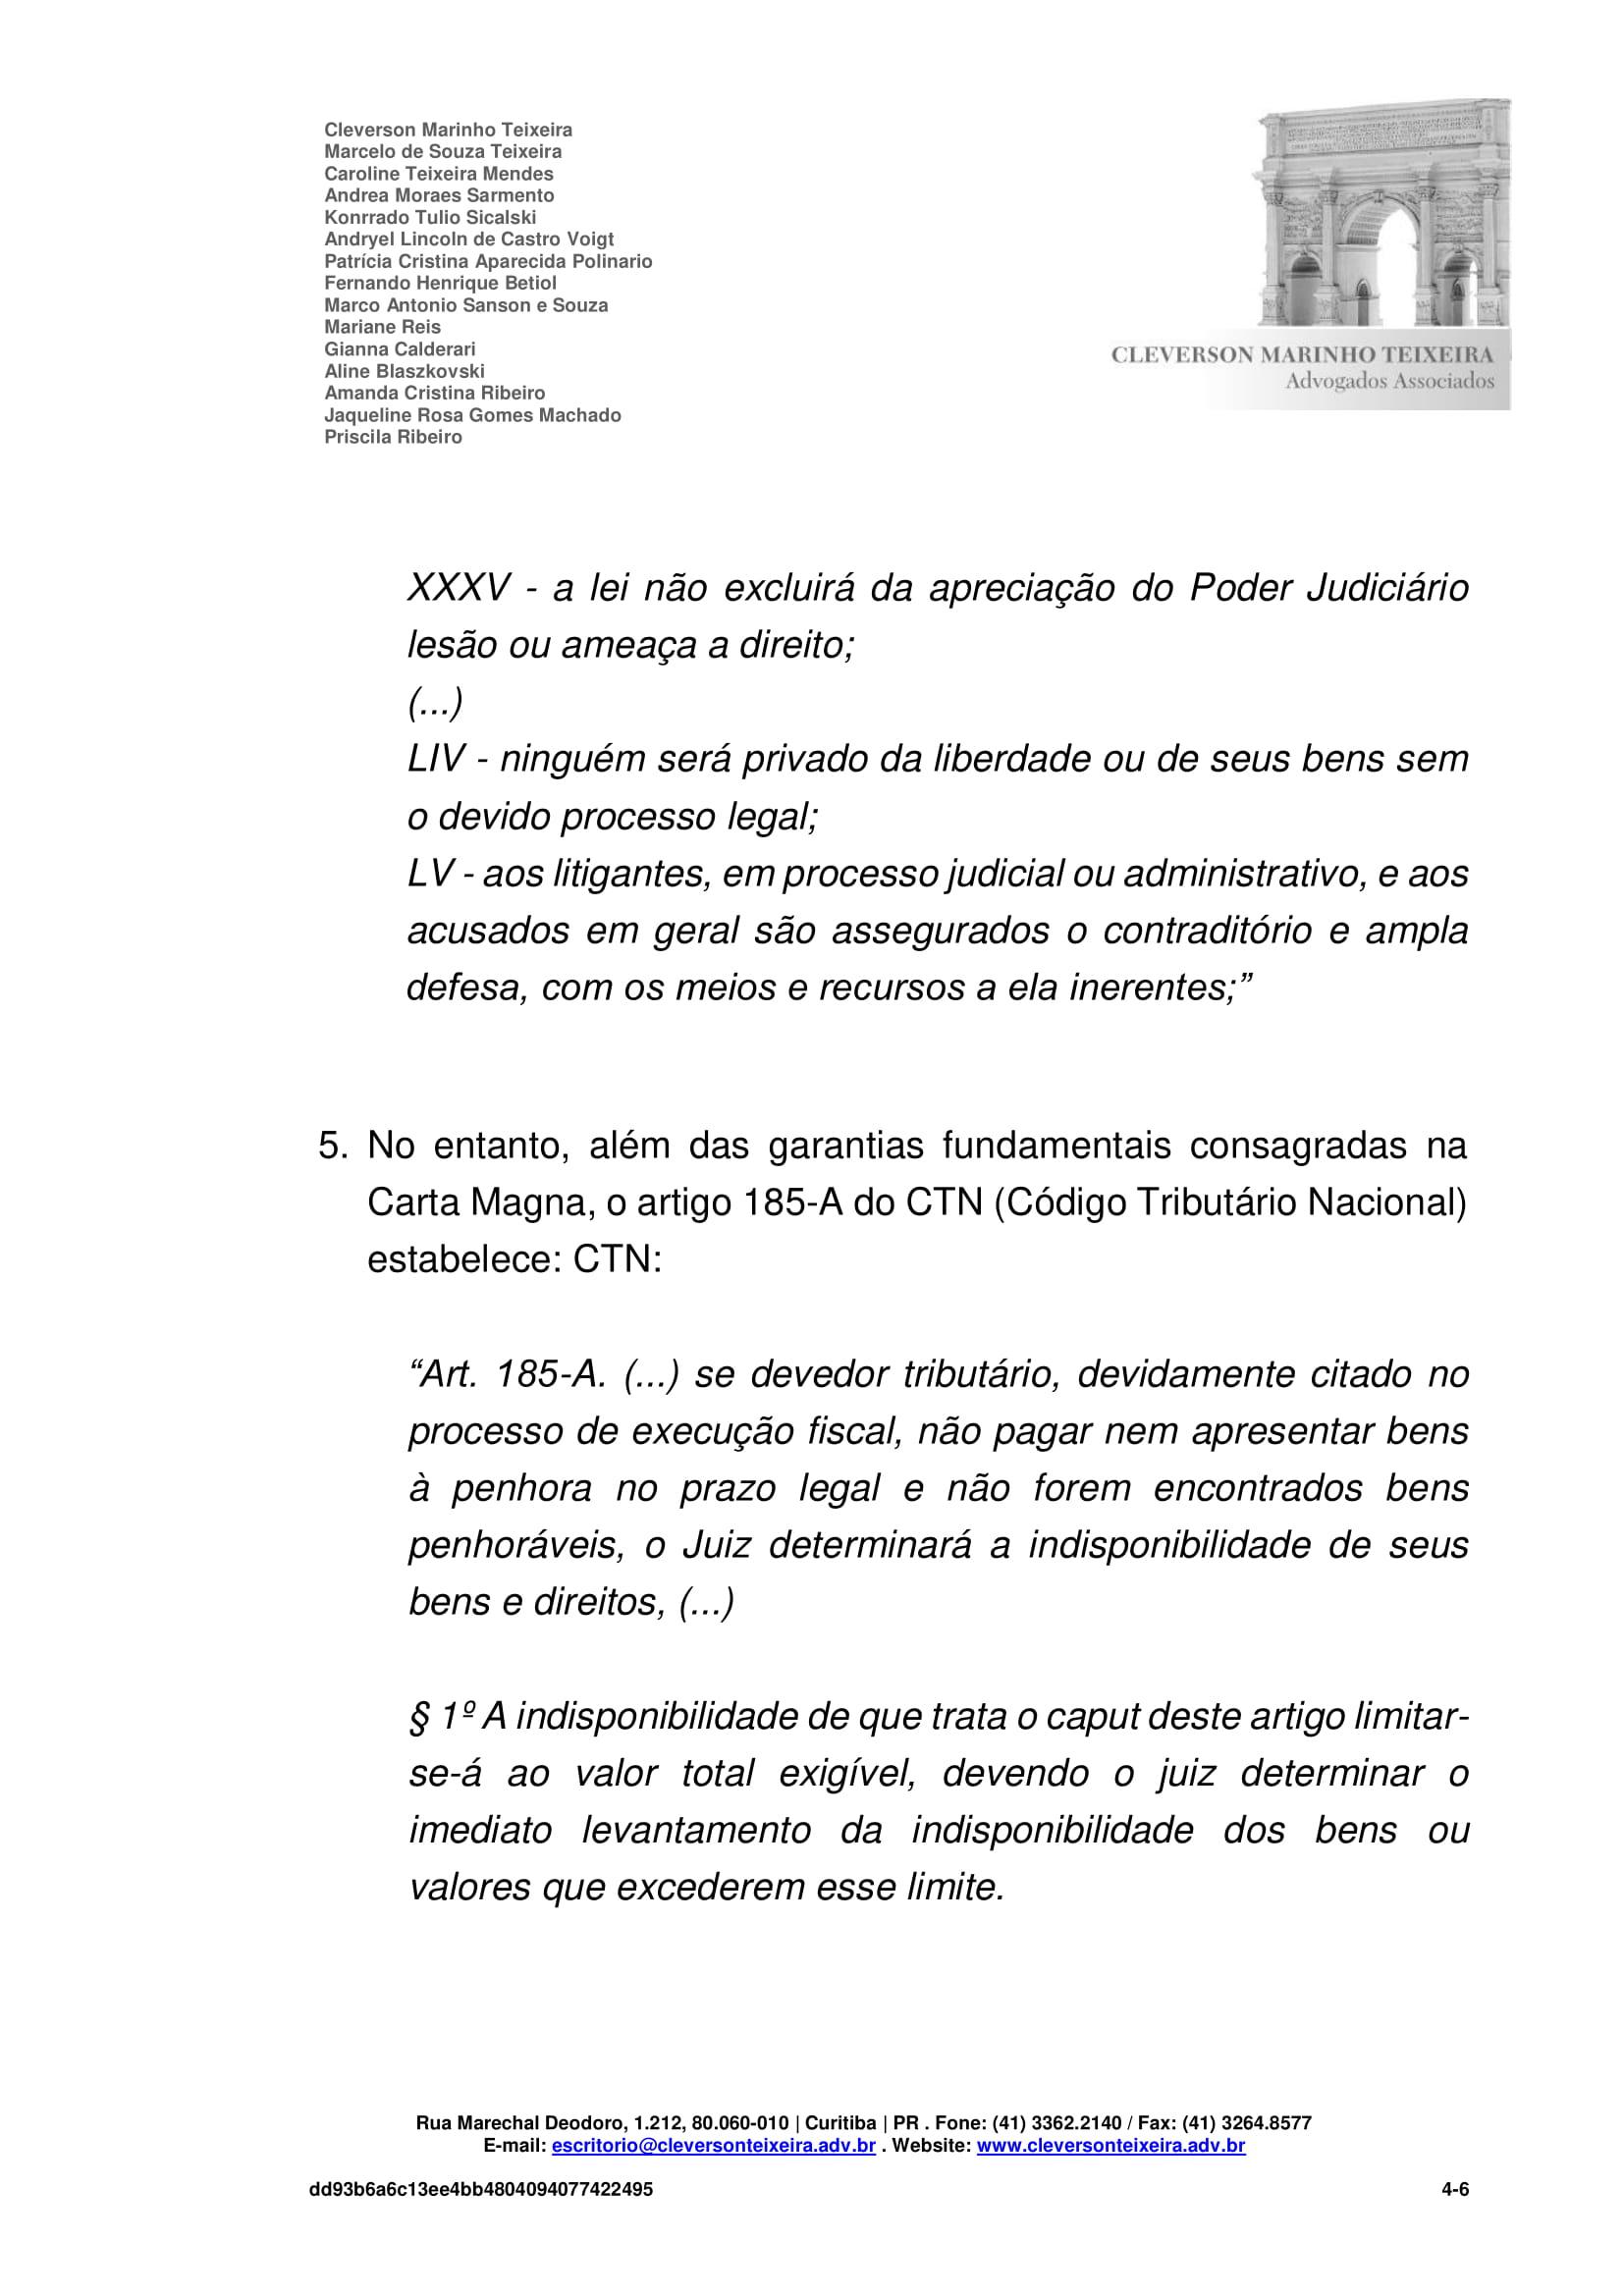 MANIFESTAÇÃO - IDL 2 (25 01 2016) (1)-4